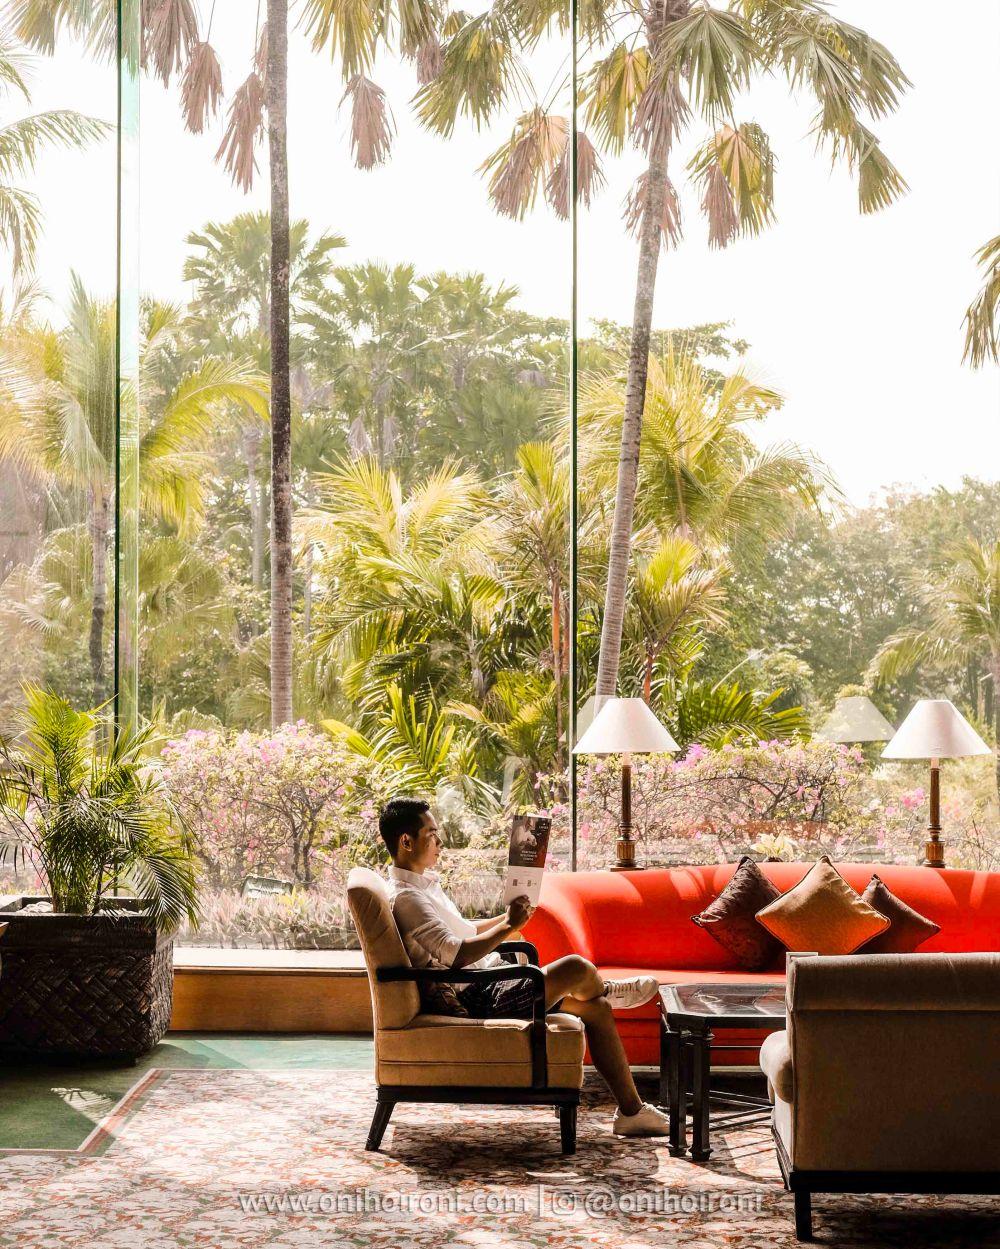 3 Review Lobby Shangrila Surabaya Hotel Oni hoironi